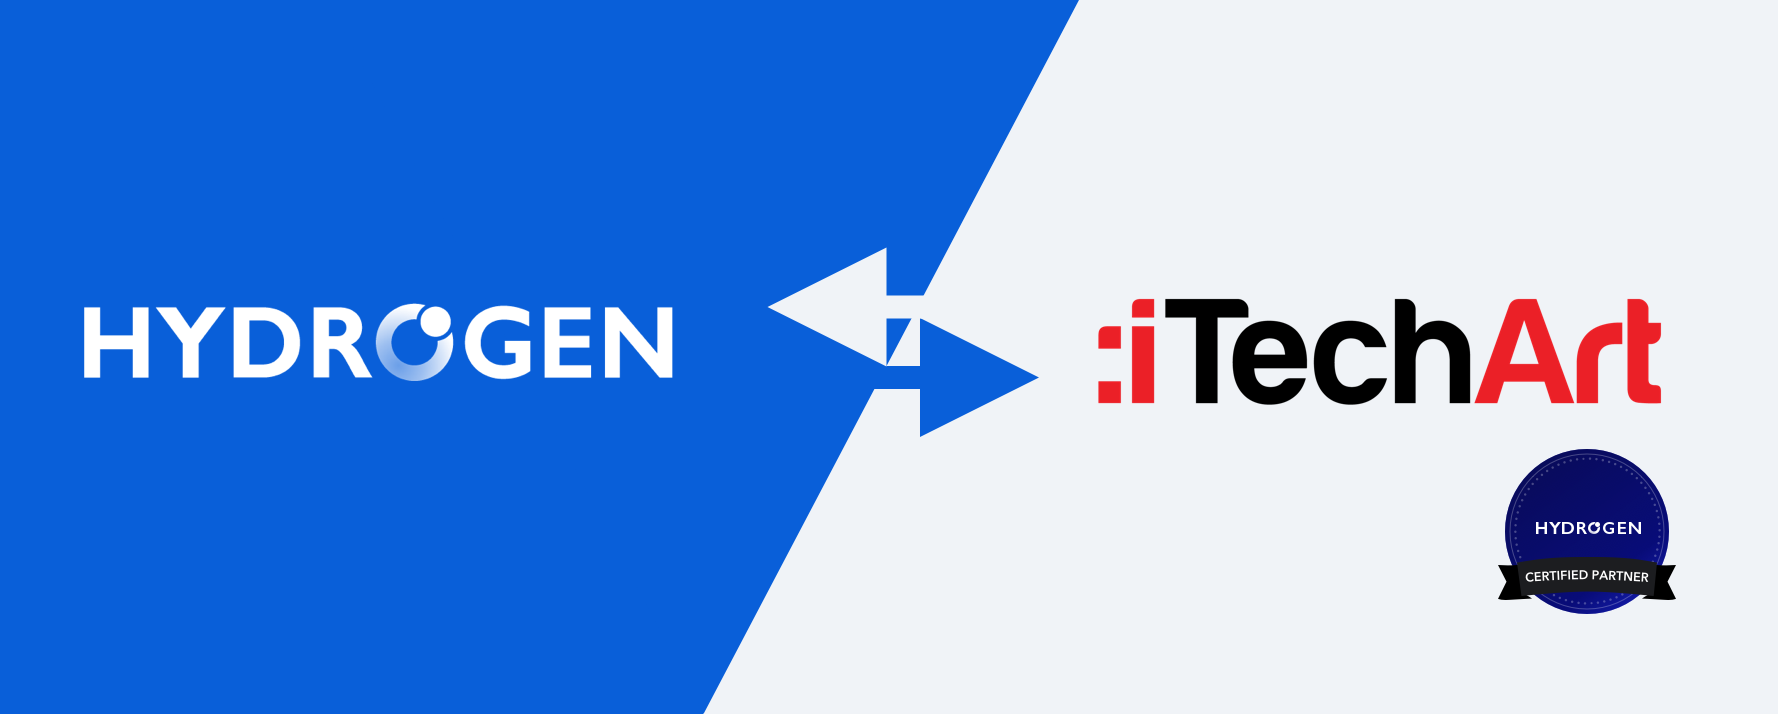 iTechArt Enters Hydrogen's Partner Marketplace